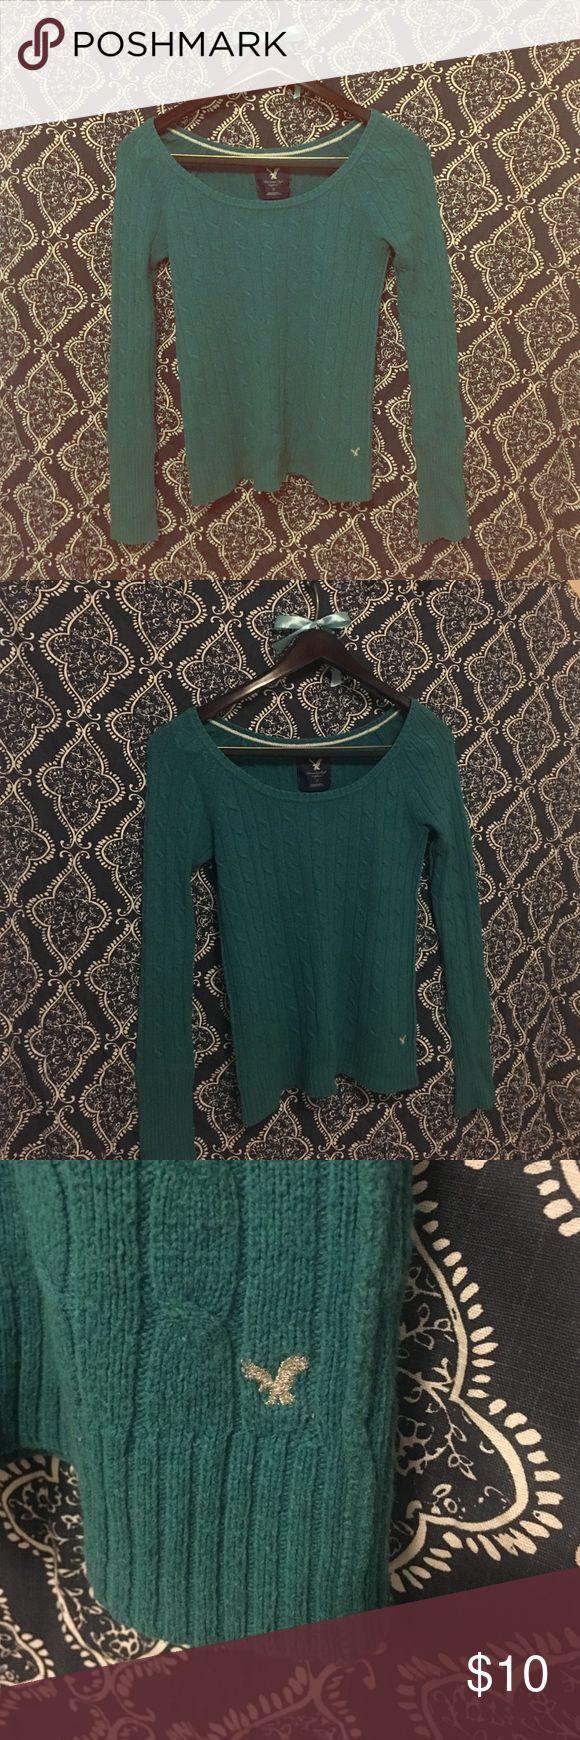 Blue/Green American Eagle Sweater! Blue/green scoop neck American Eagle Sweater! Silver eagle detail. American Eagle Outfitters Sweaters Crew & Scoop Necks